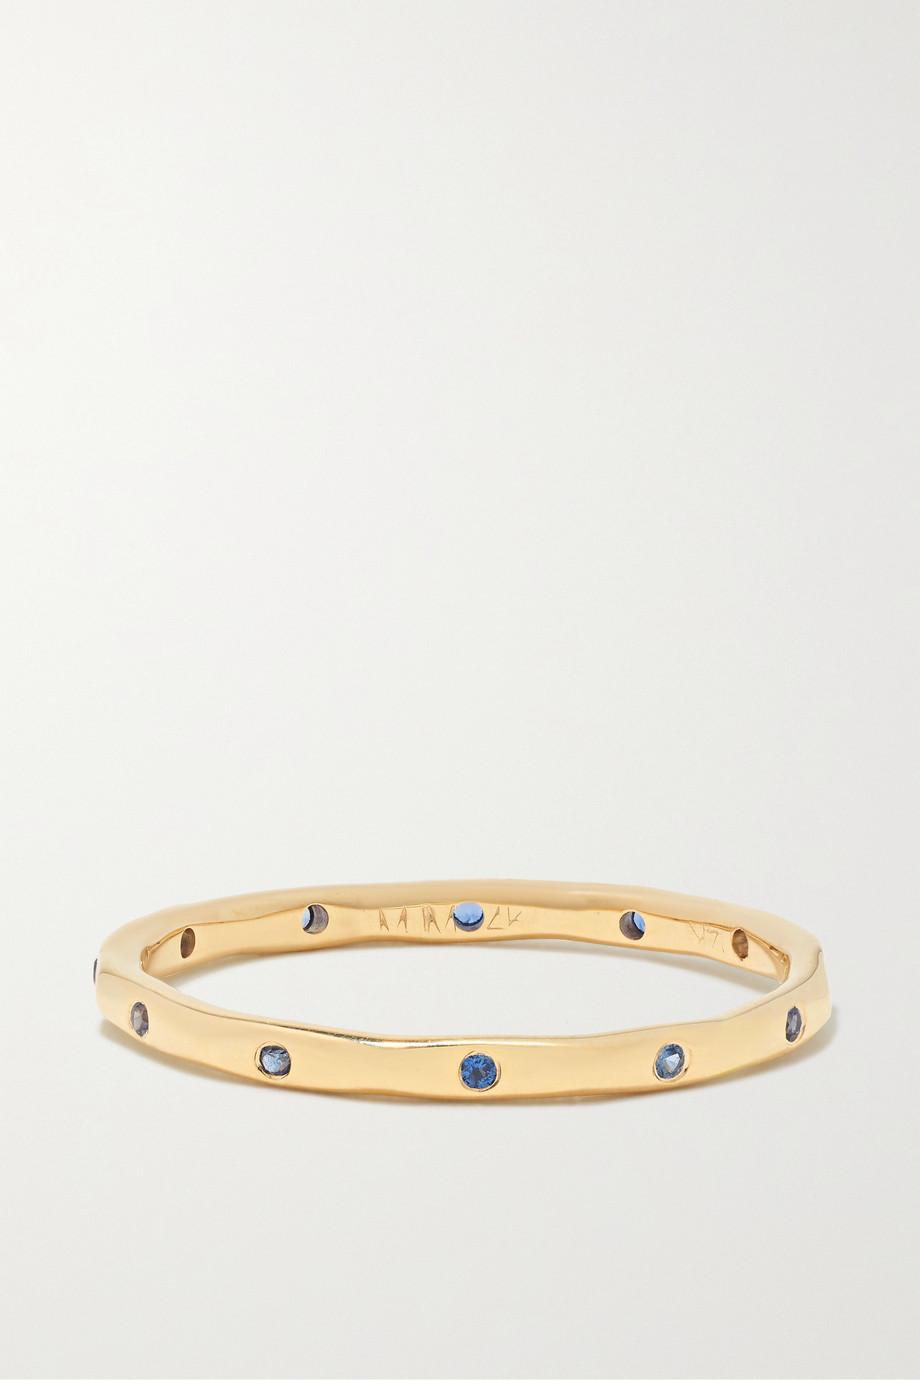 Melissa Joy Manning 14-karat gold sapphire ring